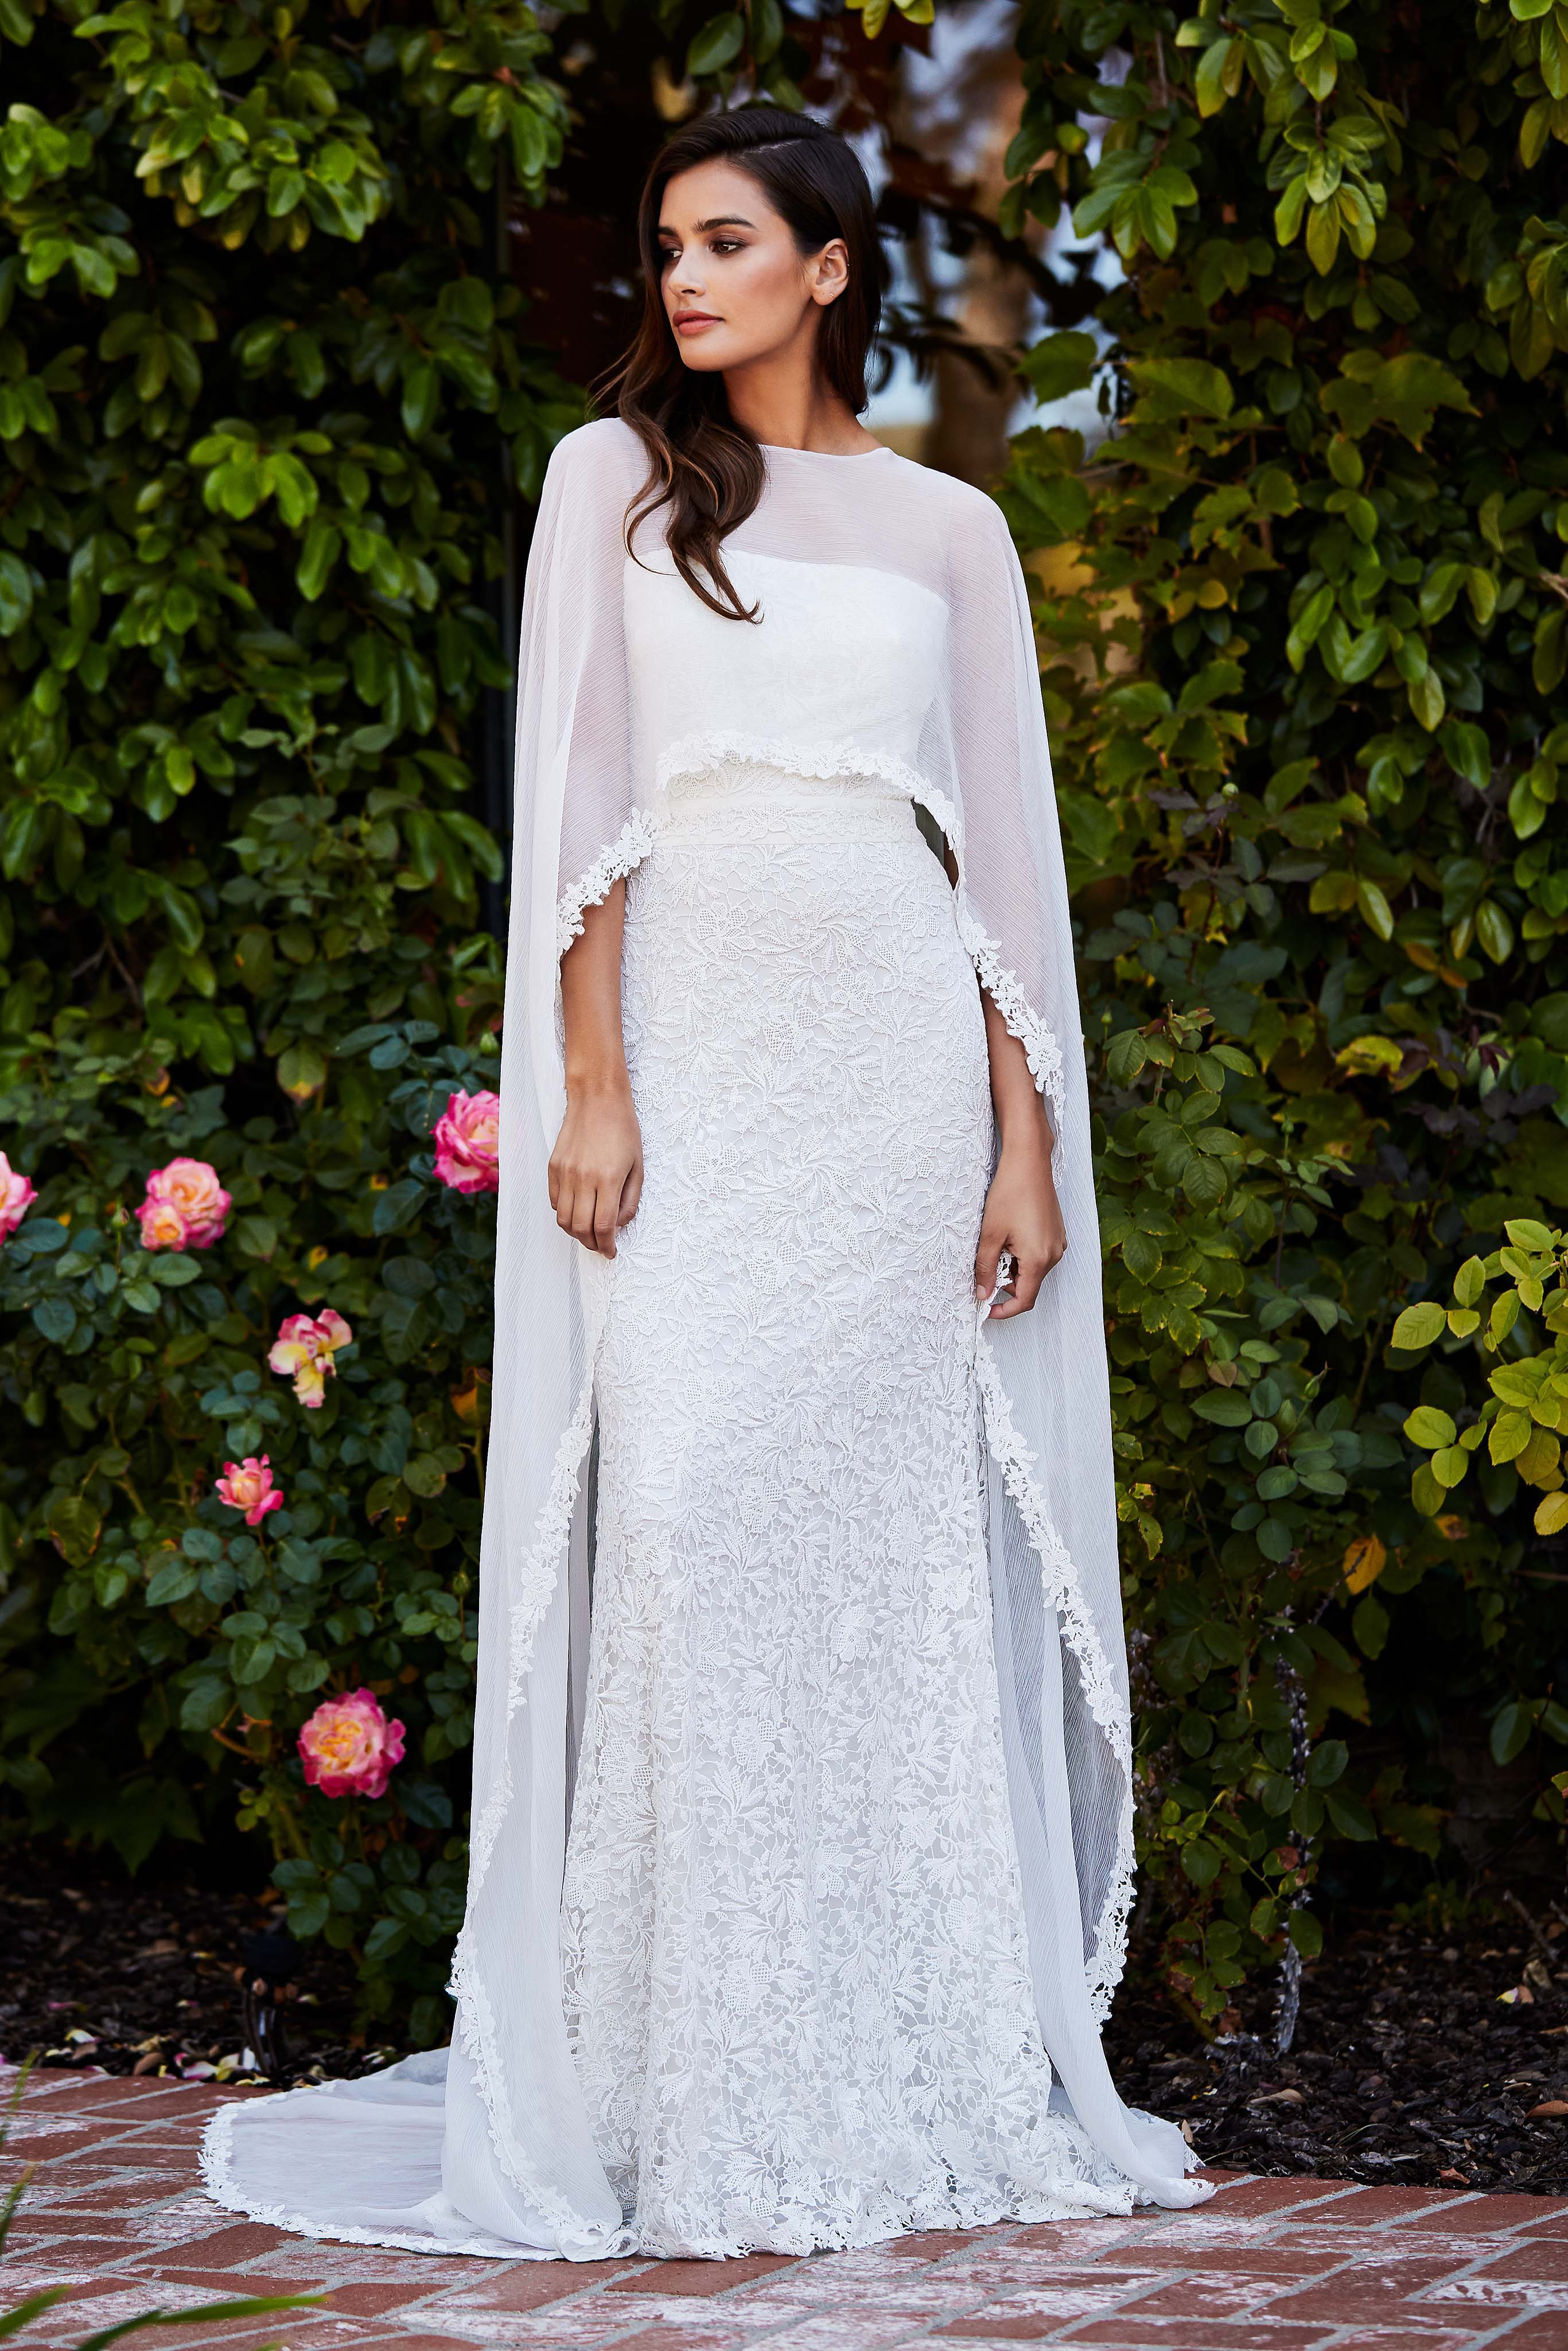 tadashi shoji wedding dress fall 2018 lace embroidered cape